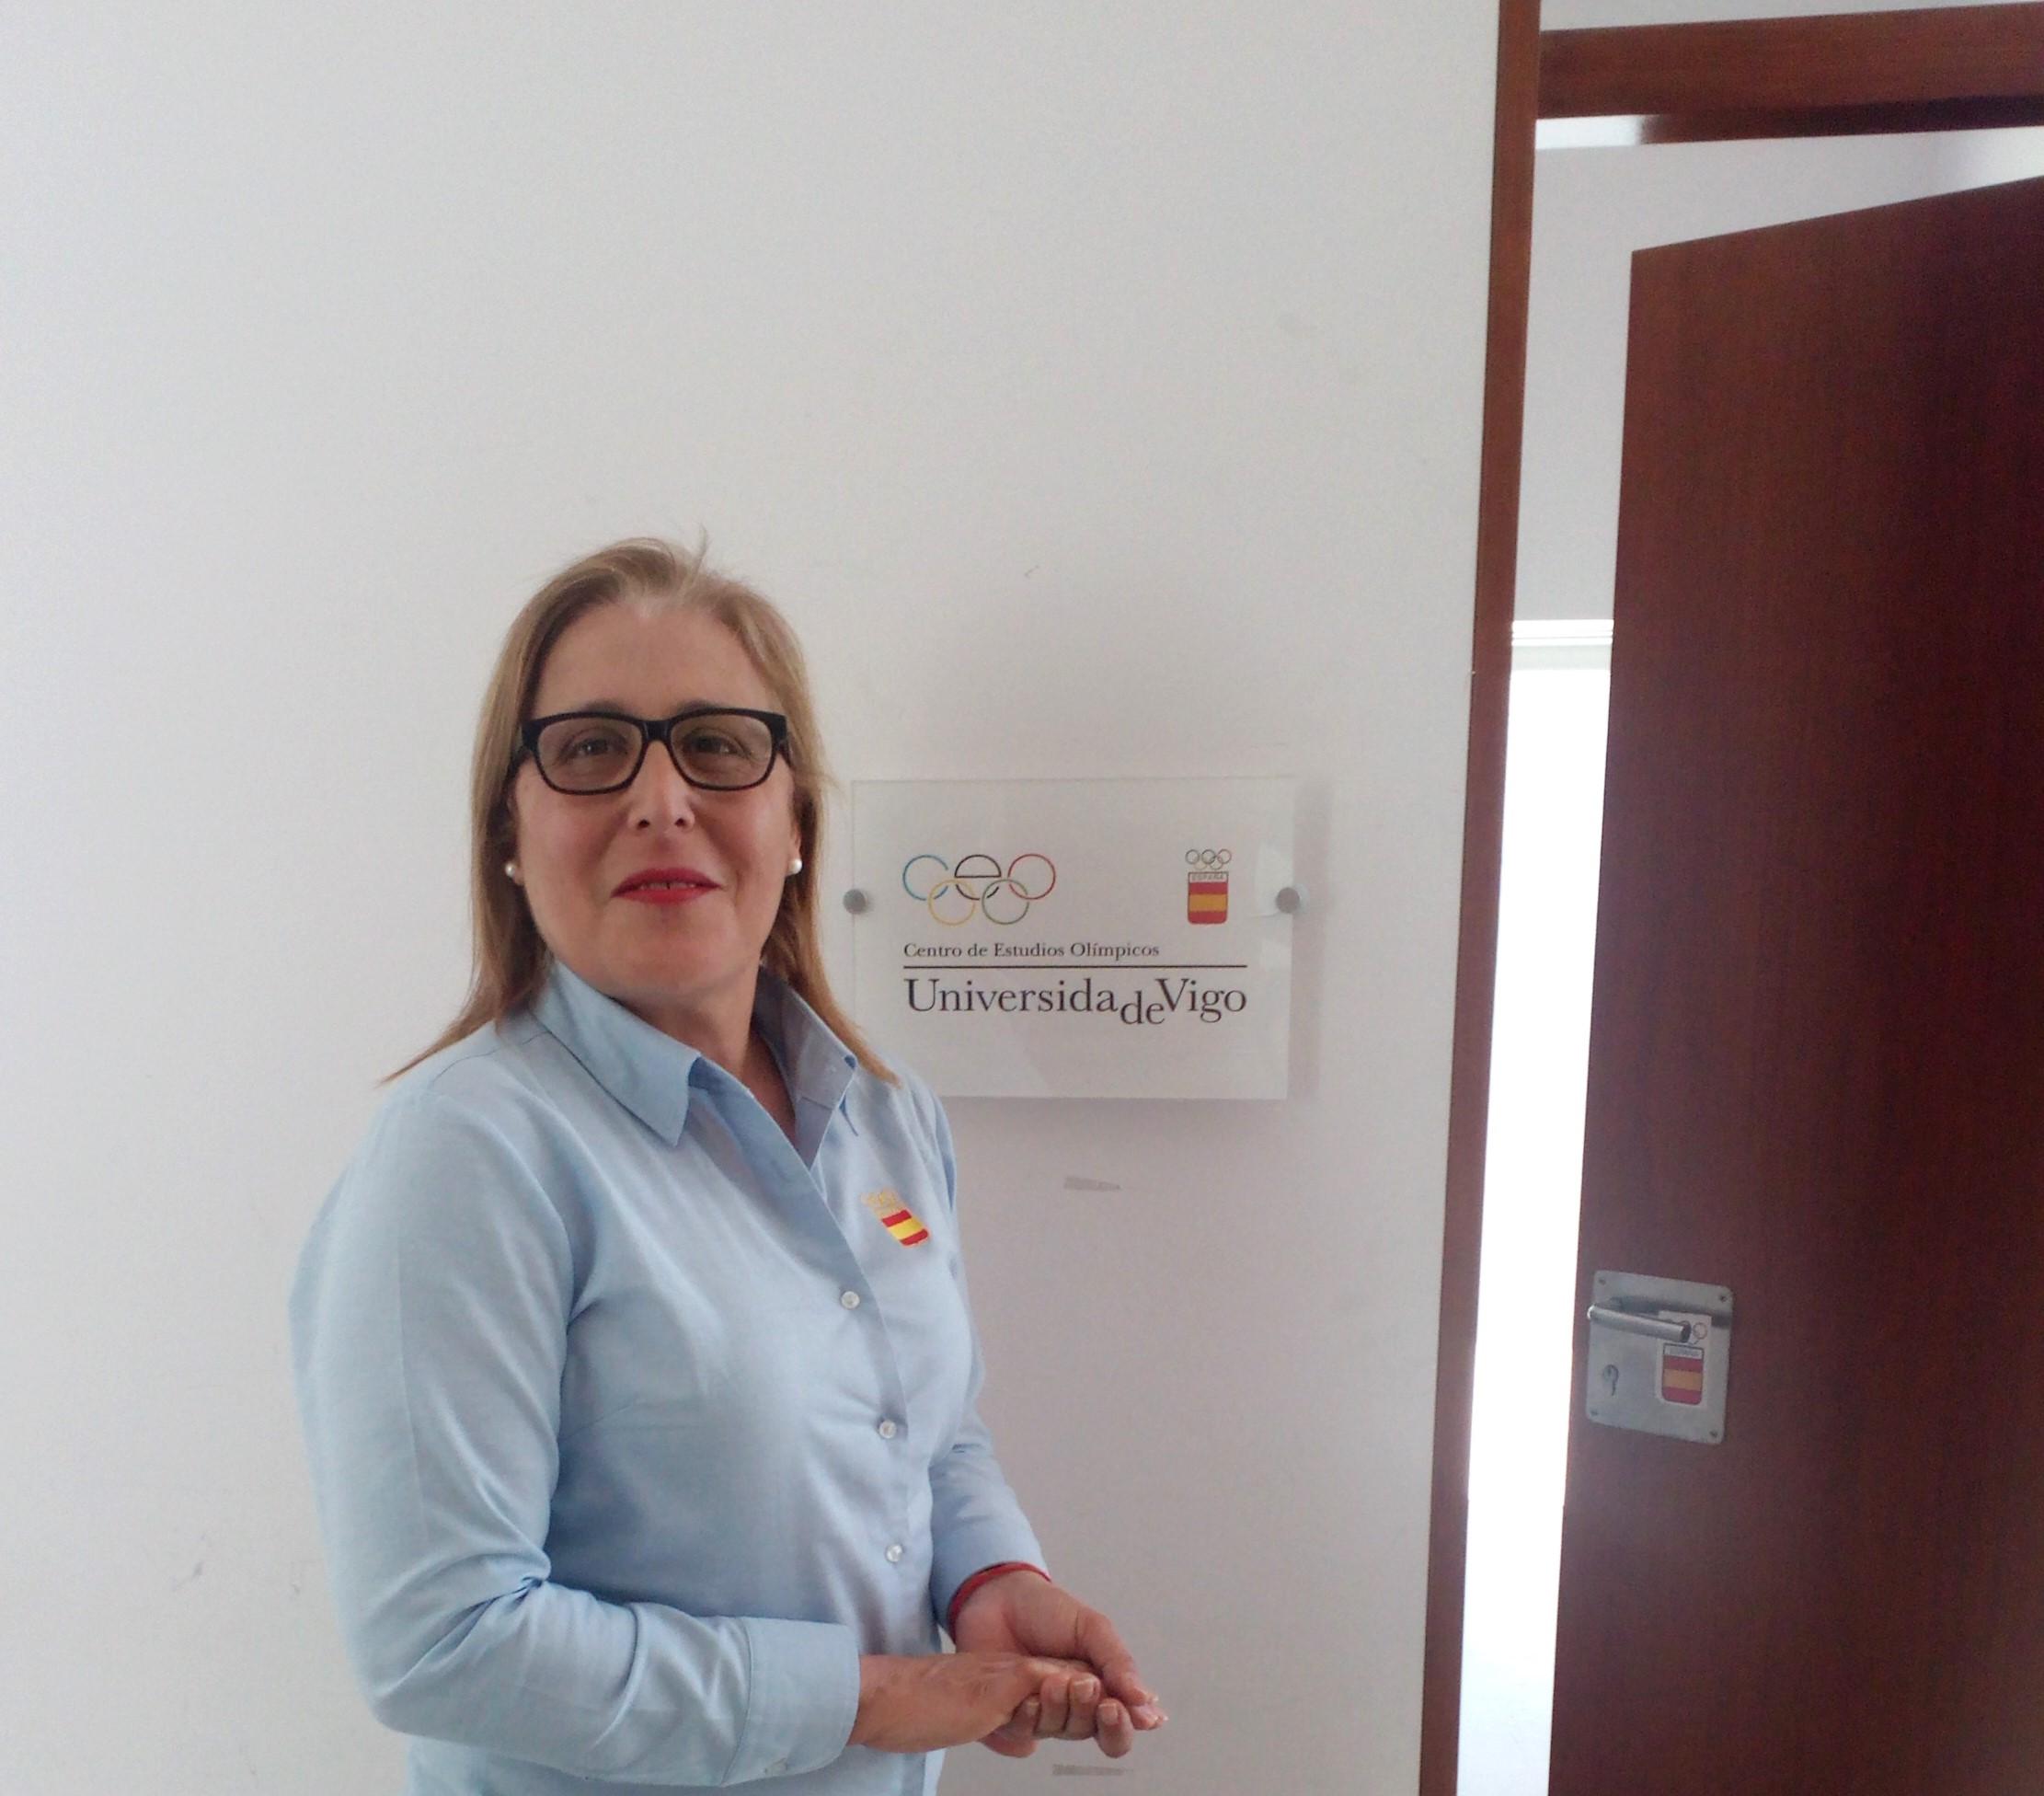 Dra. Mª José Martínez Patiño